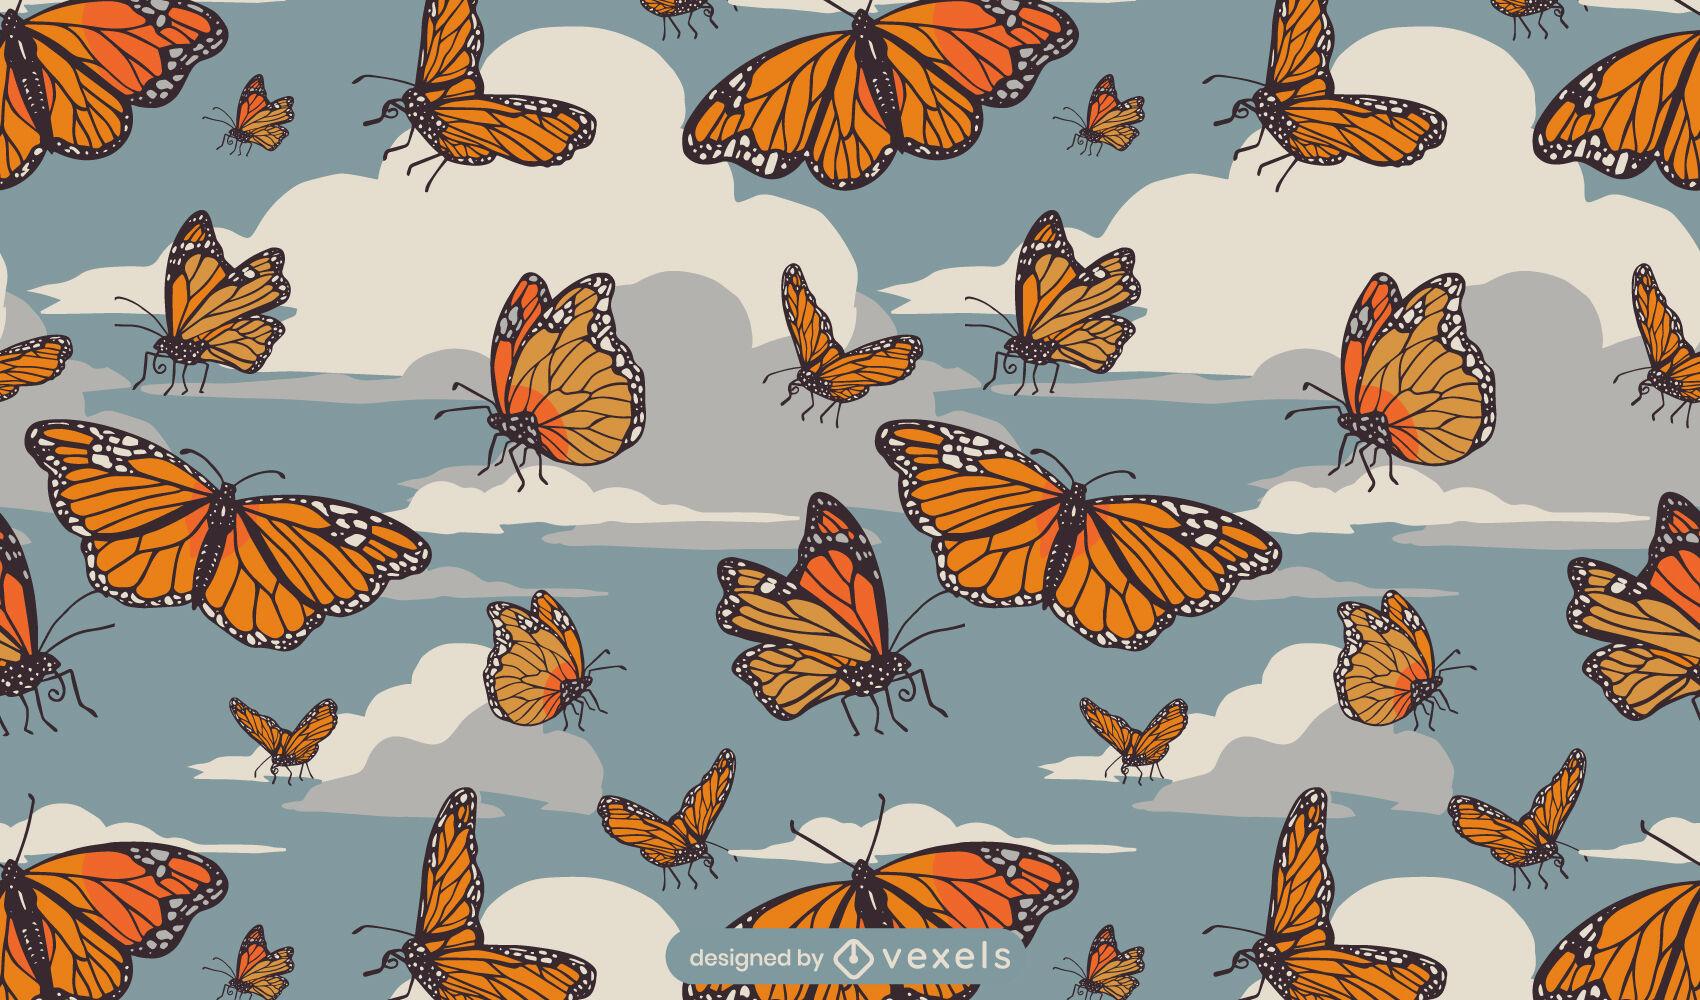 Schmetterlingsinsekten, die Naturmusterdesign fliegen